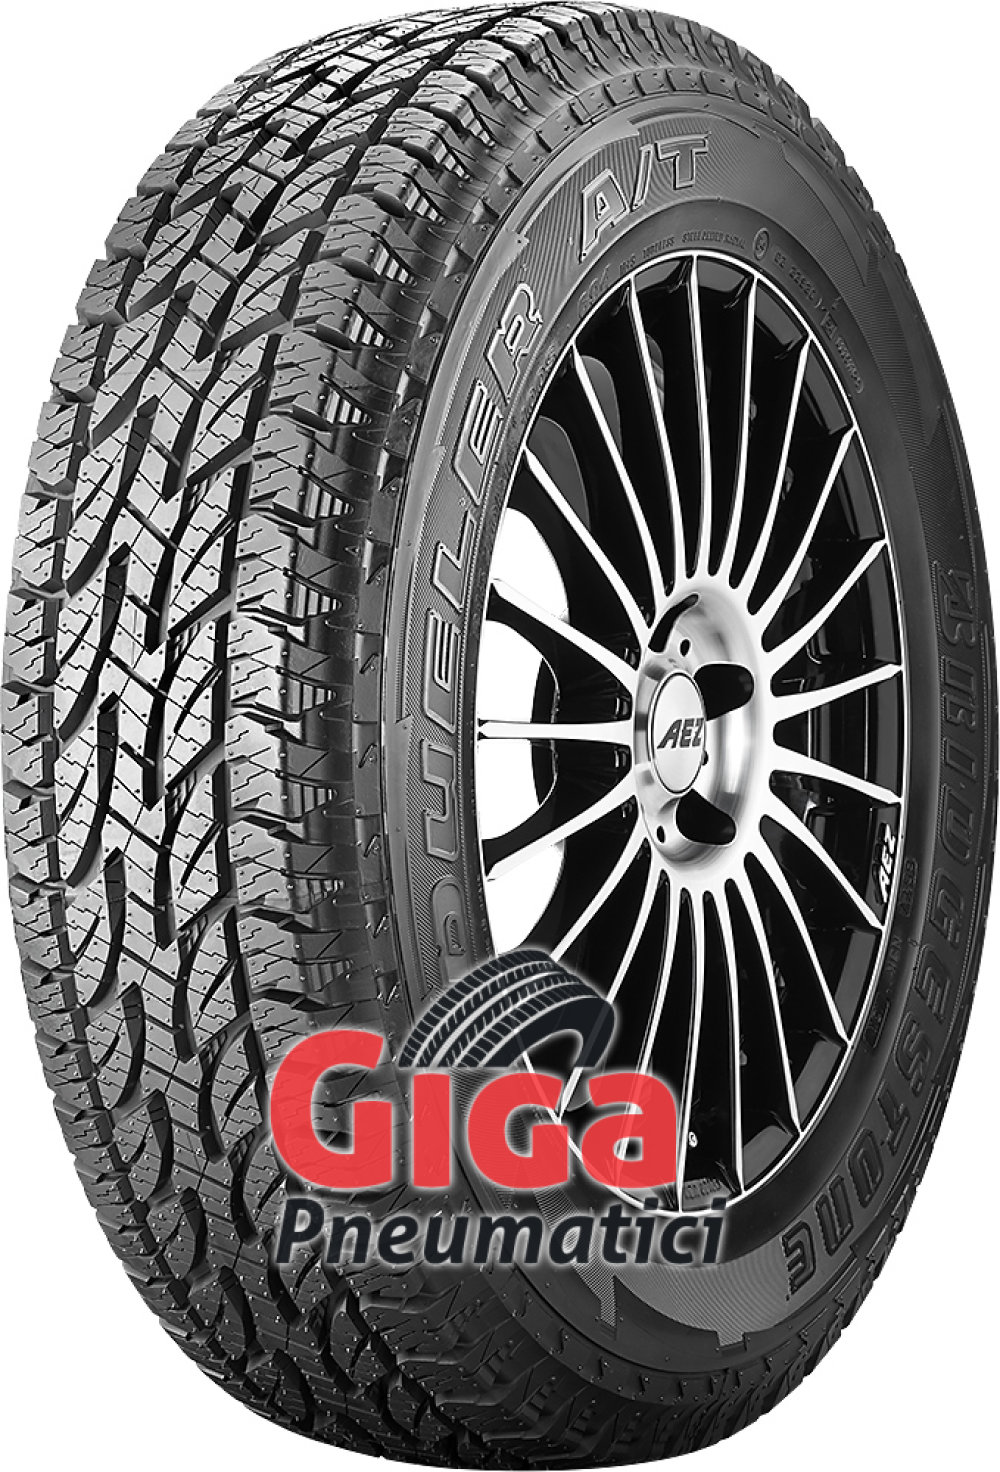 Bridgestone Dueler A/T 694 ( 225/70 R16 102S ROWL )